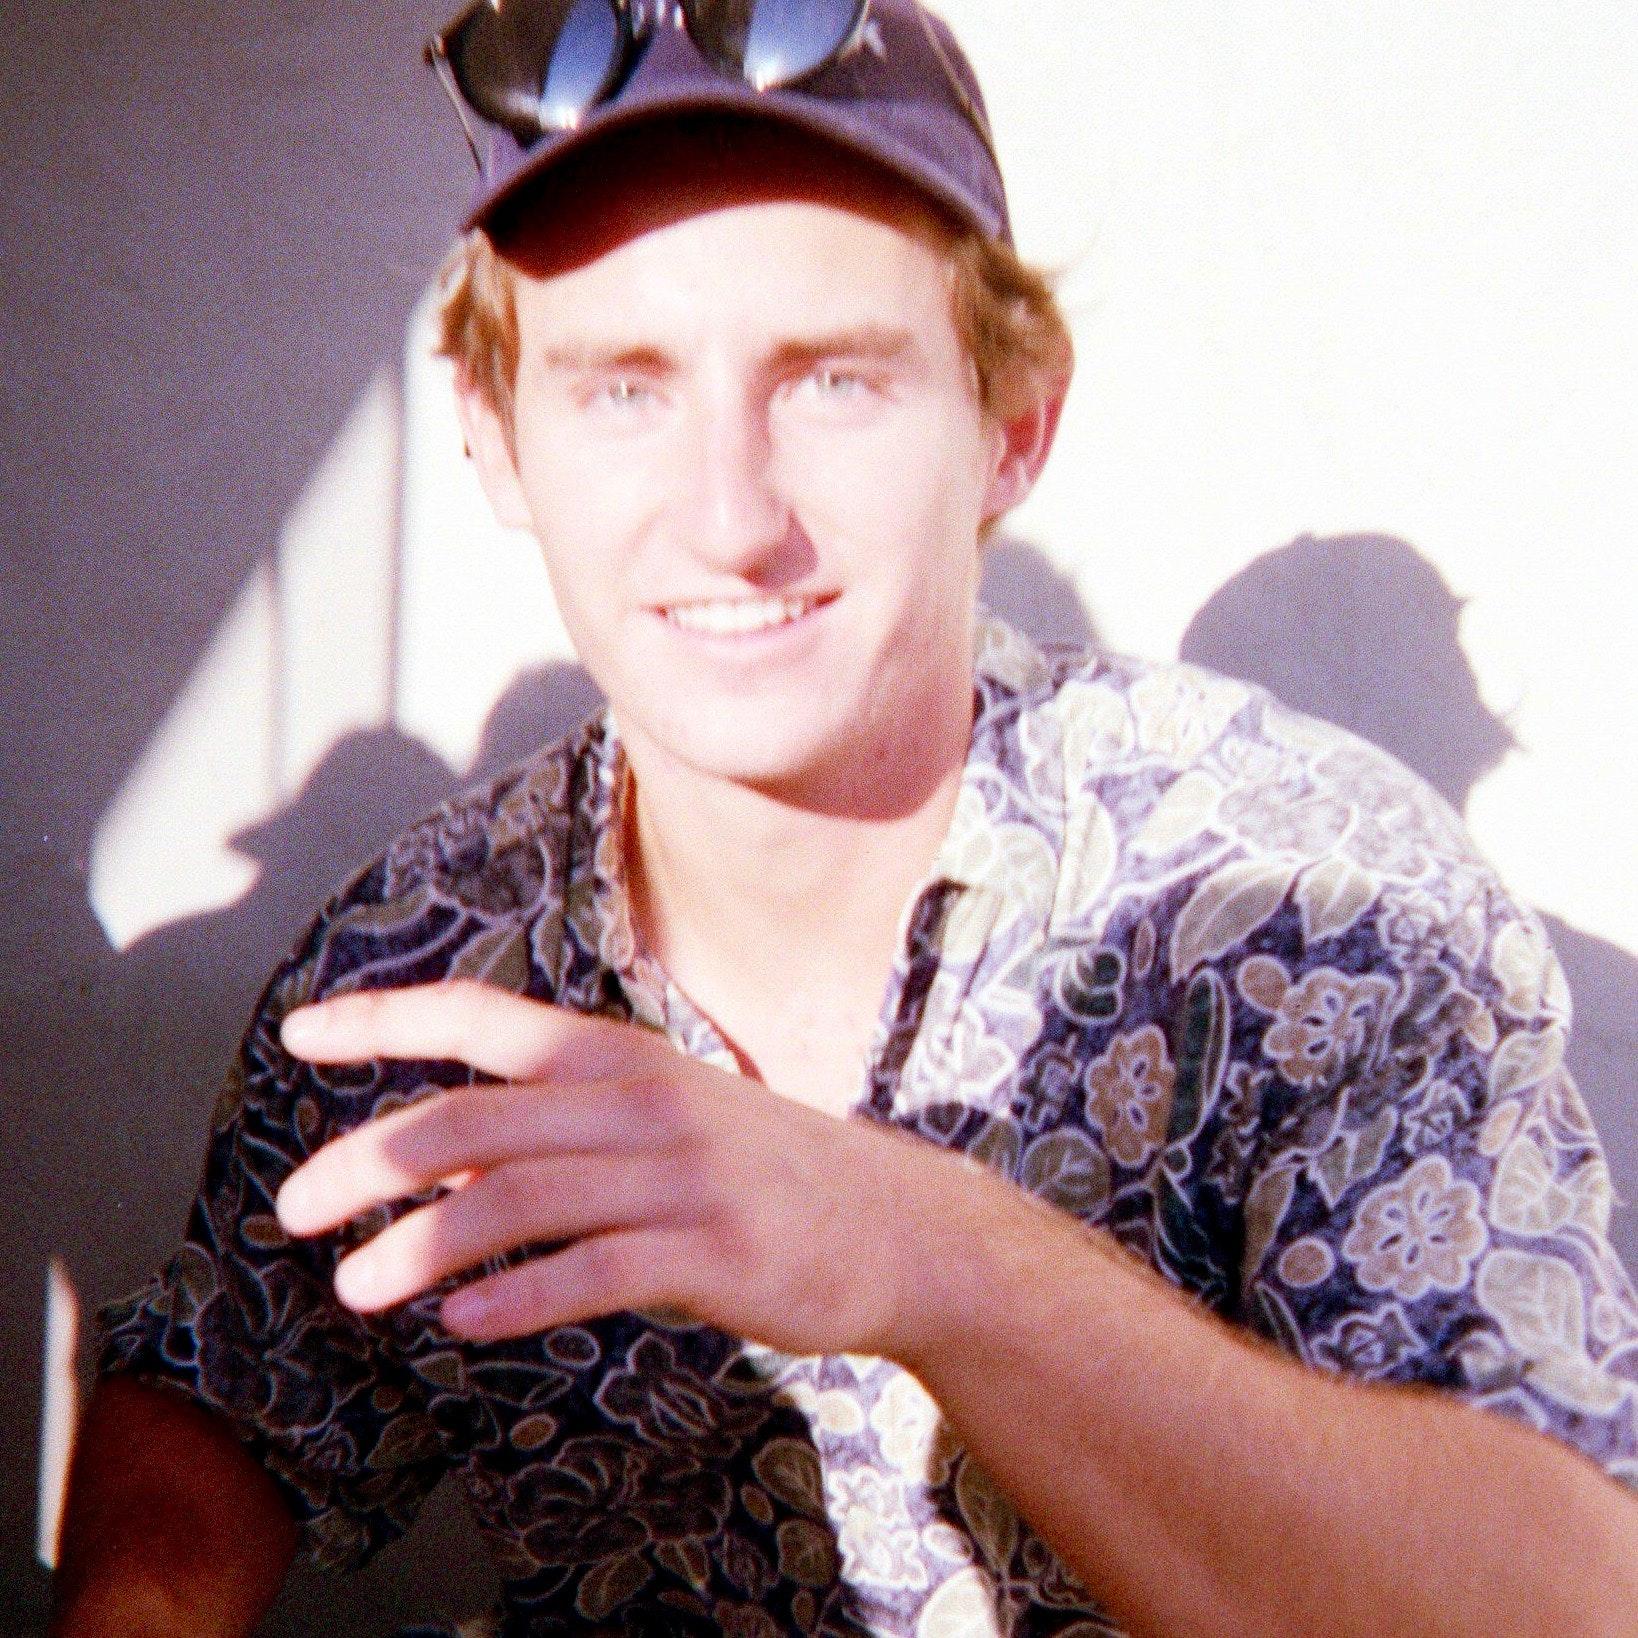 Tanner R.